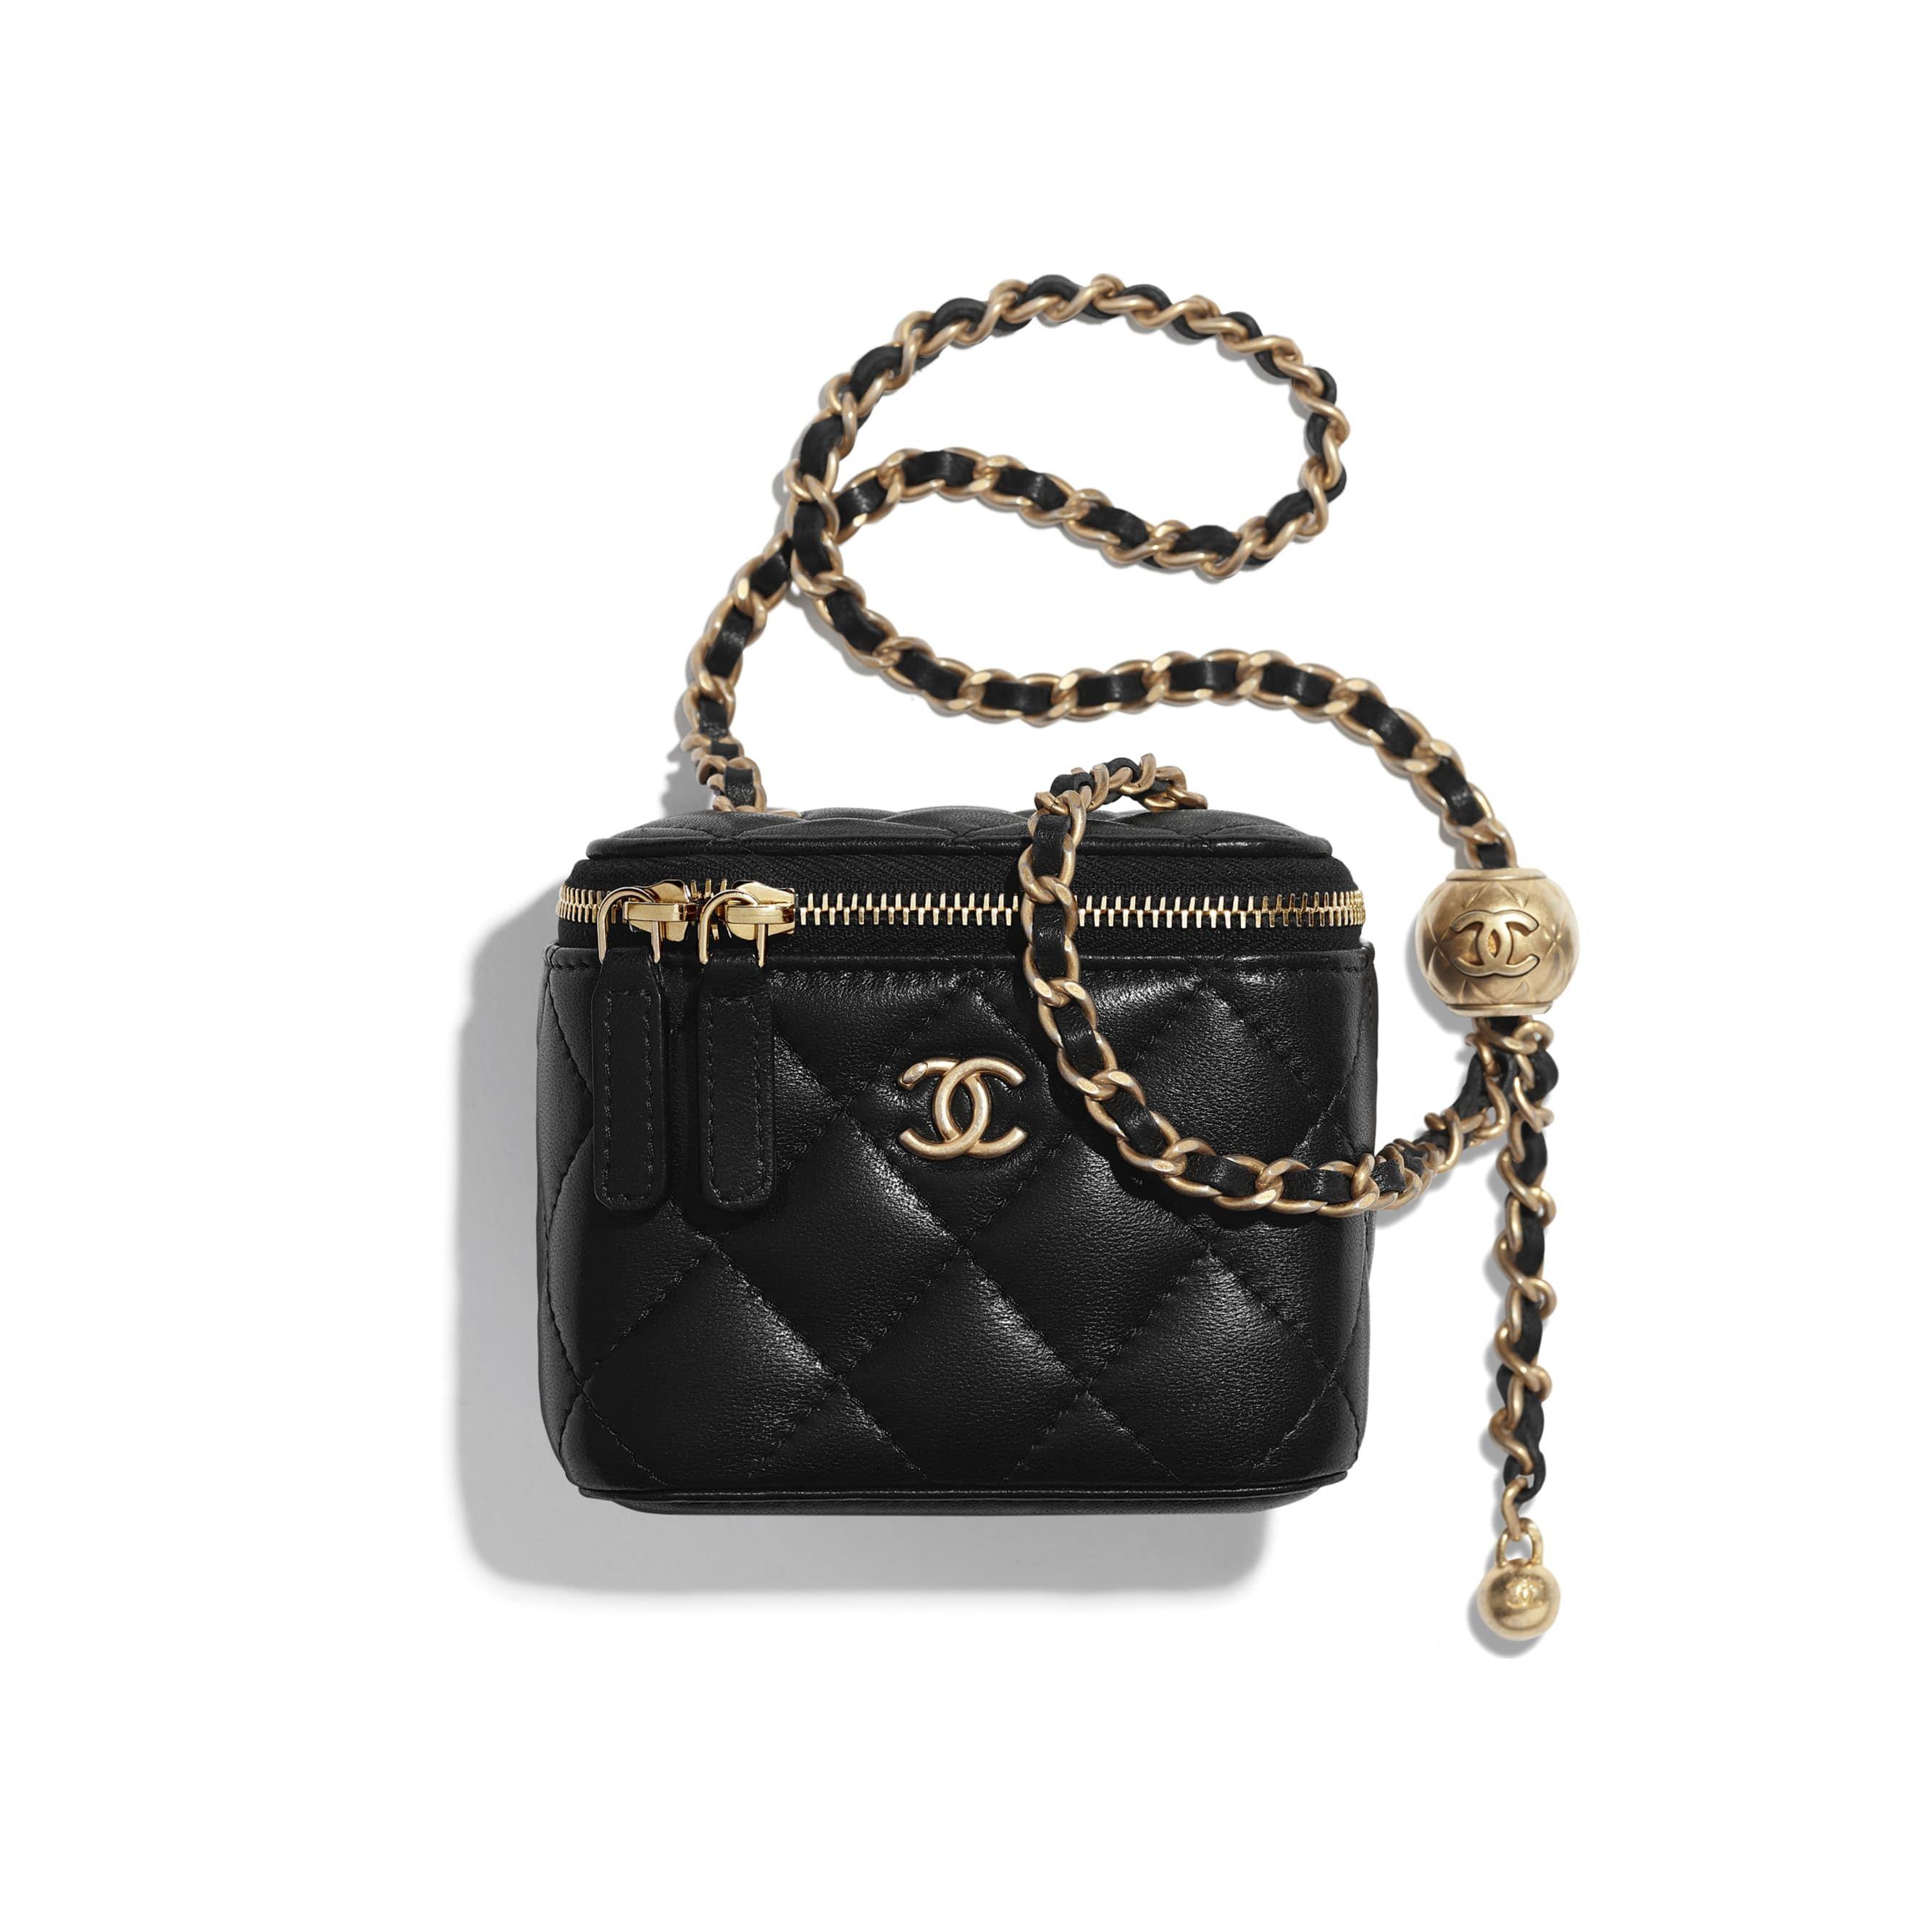 Lambskin Gold Tone Metal Black Small Classic Box With Chain Chanel In 2020 Chanel Bag Japanese Handbag Chanel Handbags